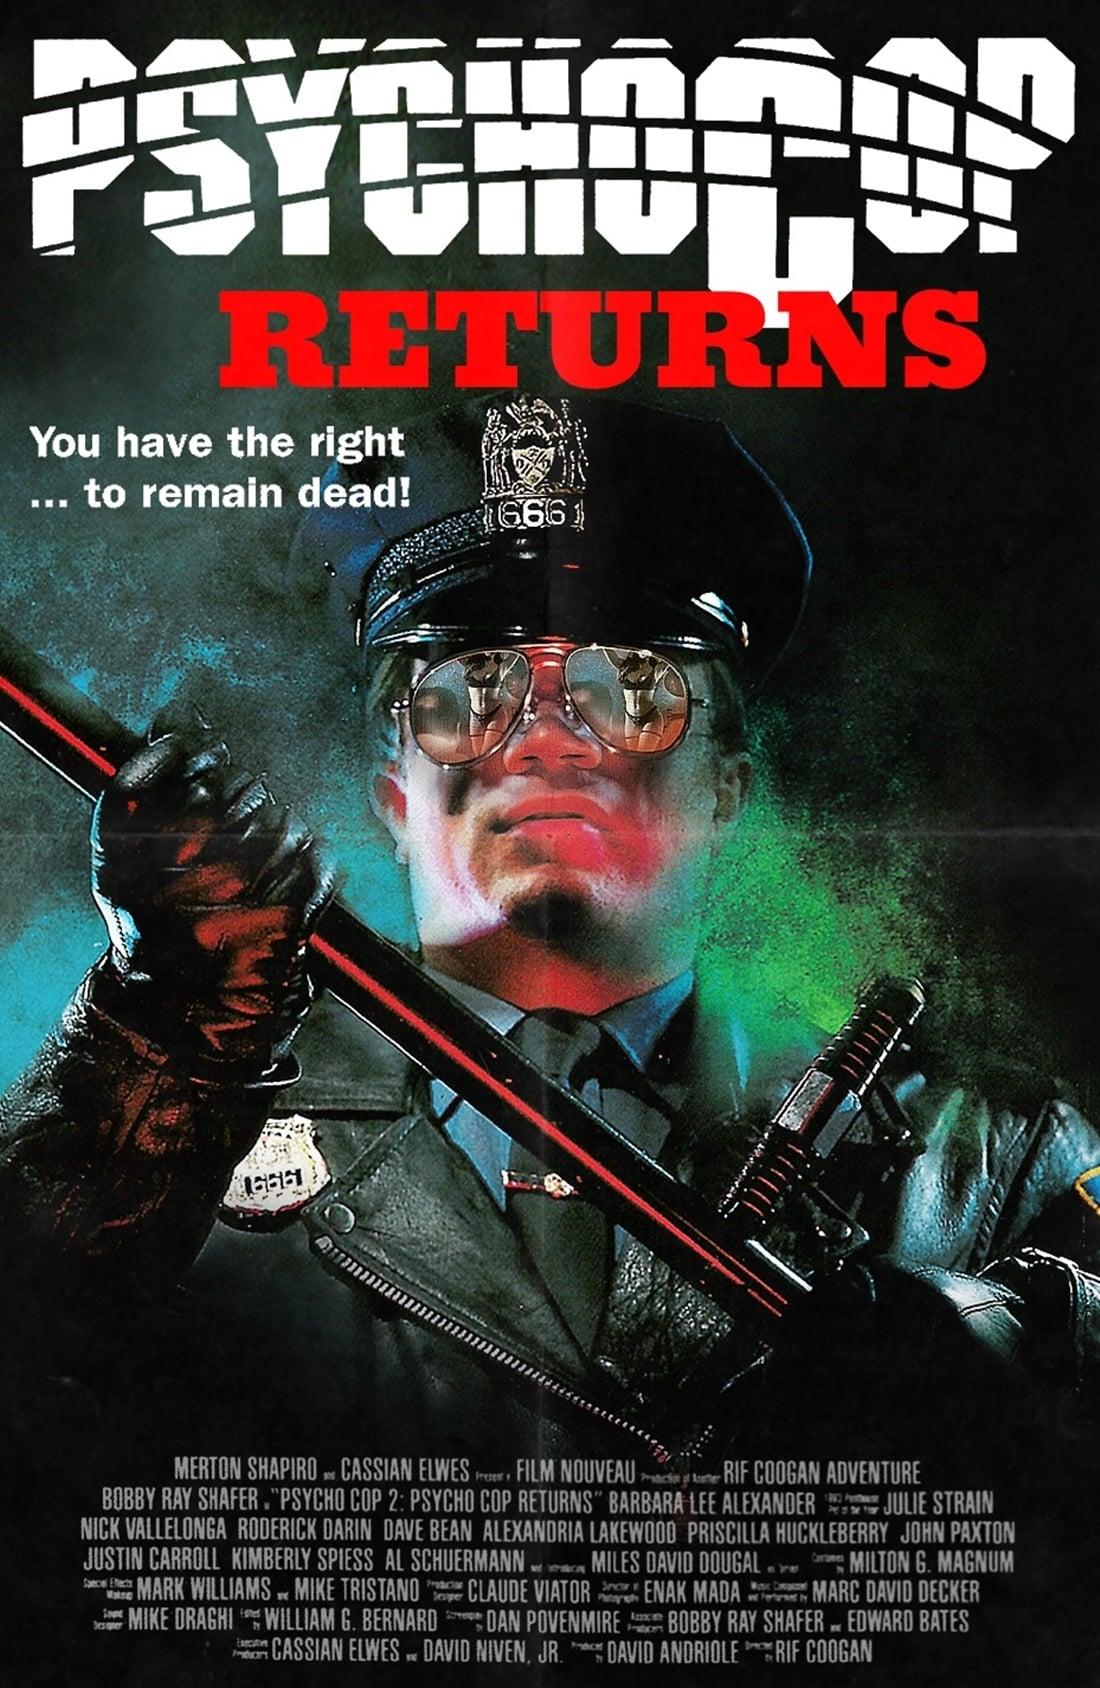 Psycho Cop Returns (1993)